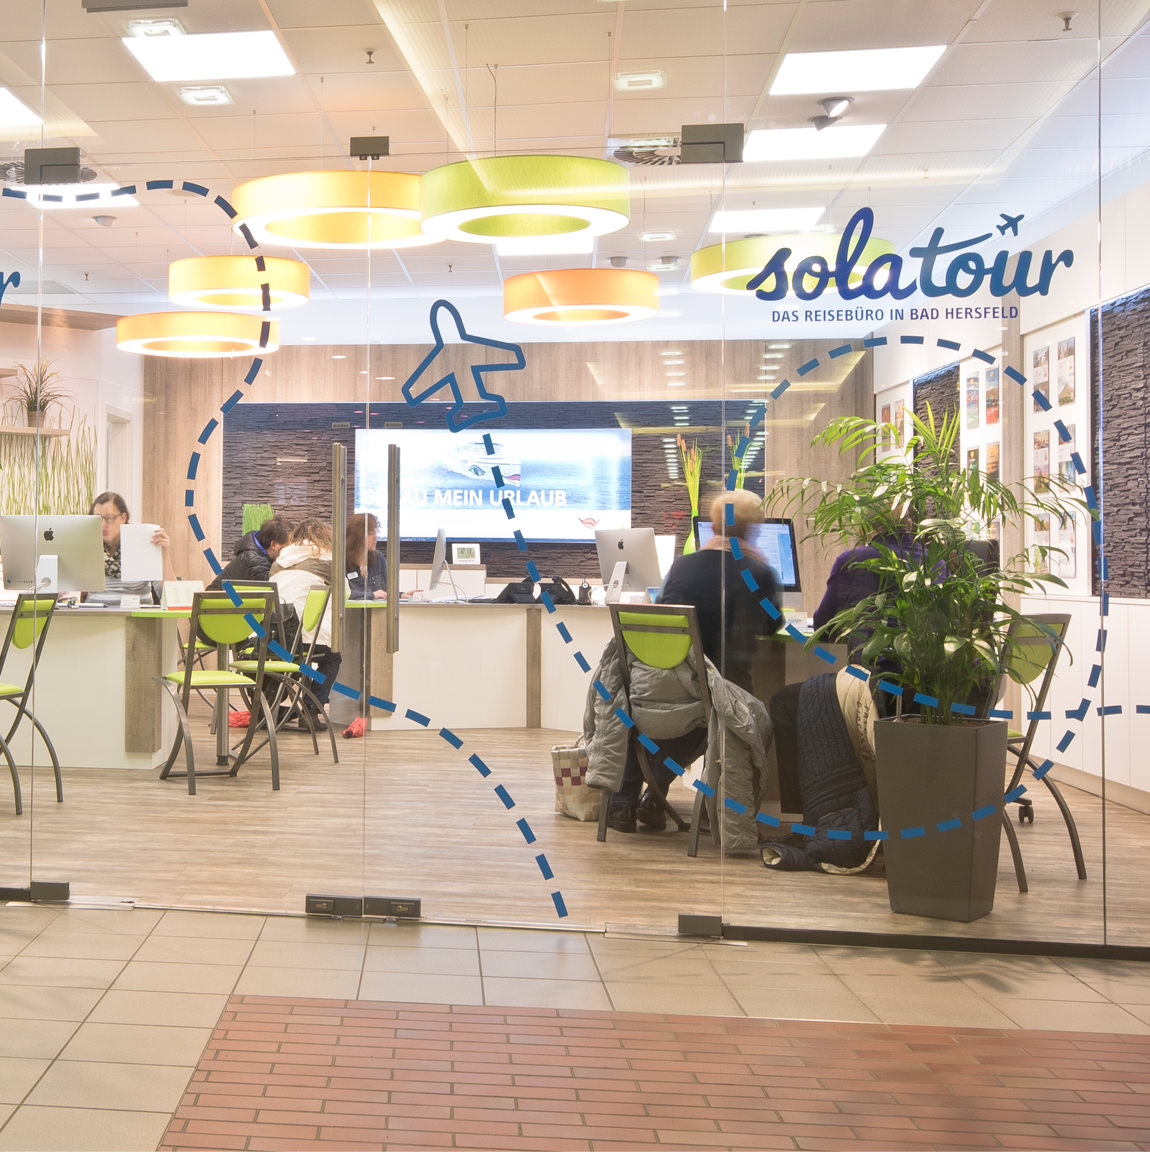 City Galerie Bad Hersfeld Reiseburo Solatour